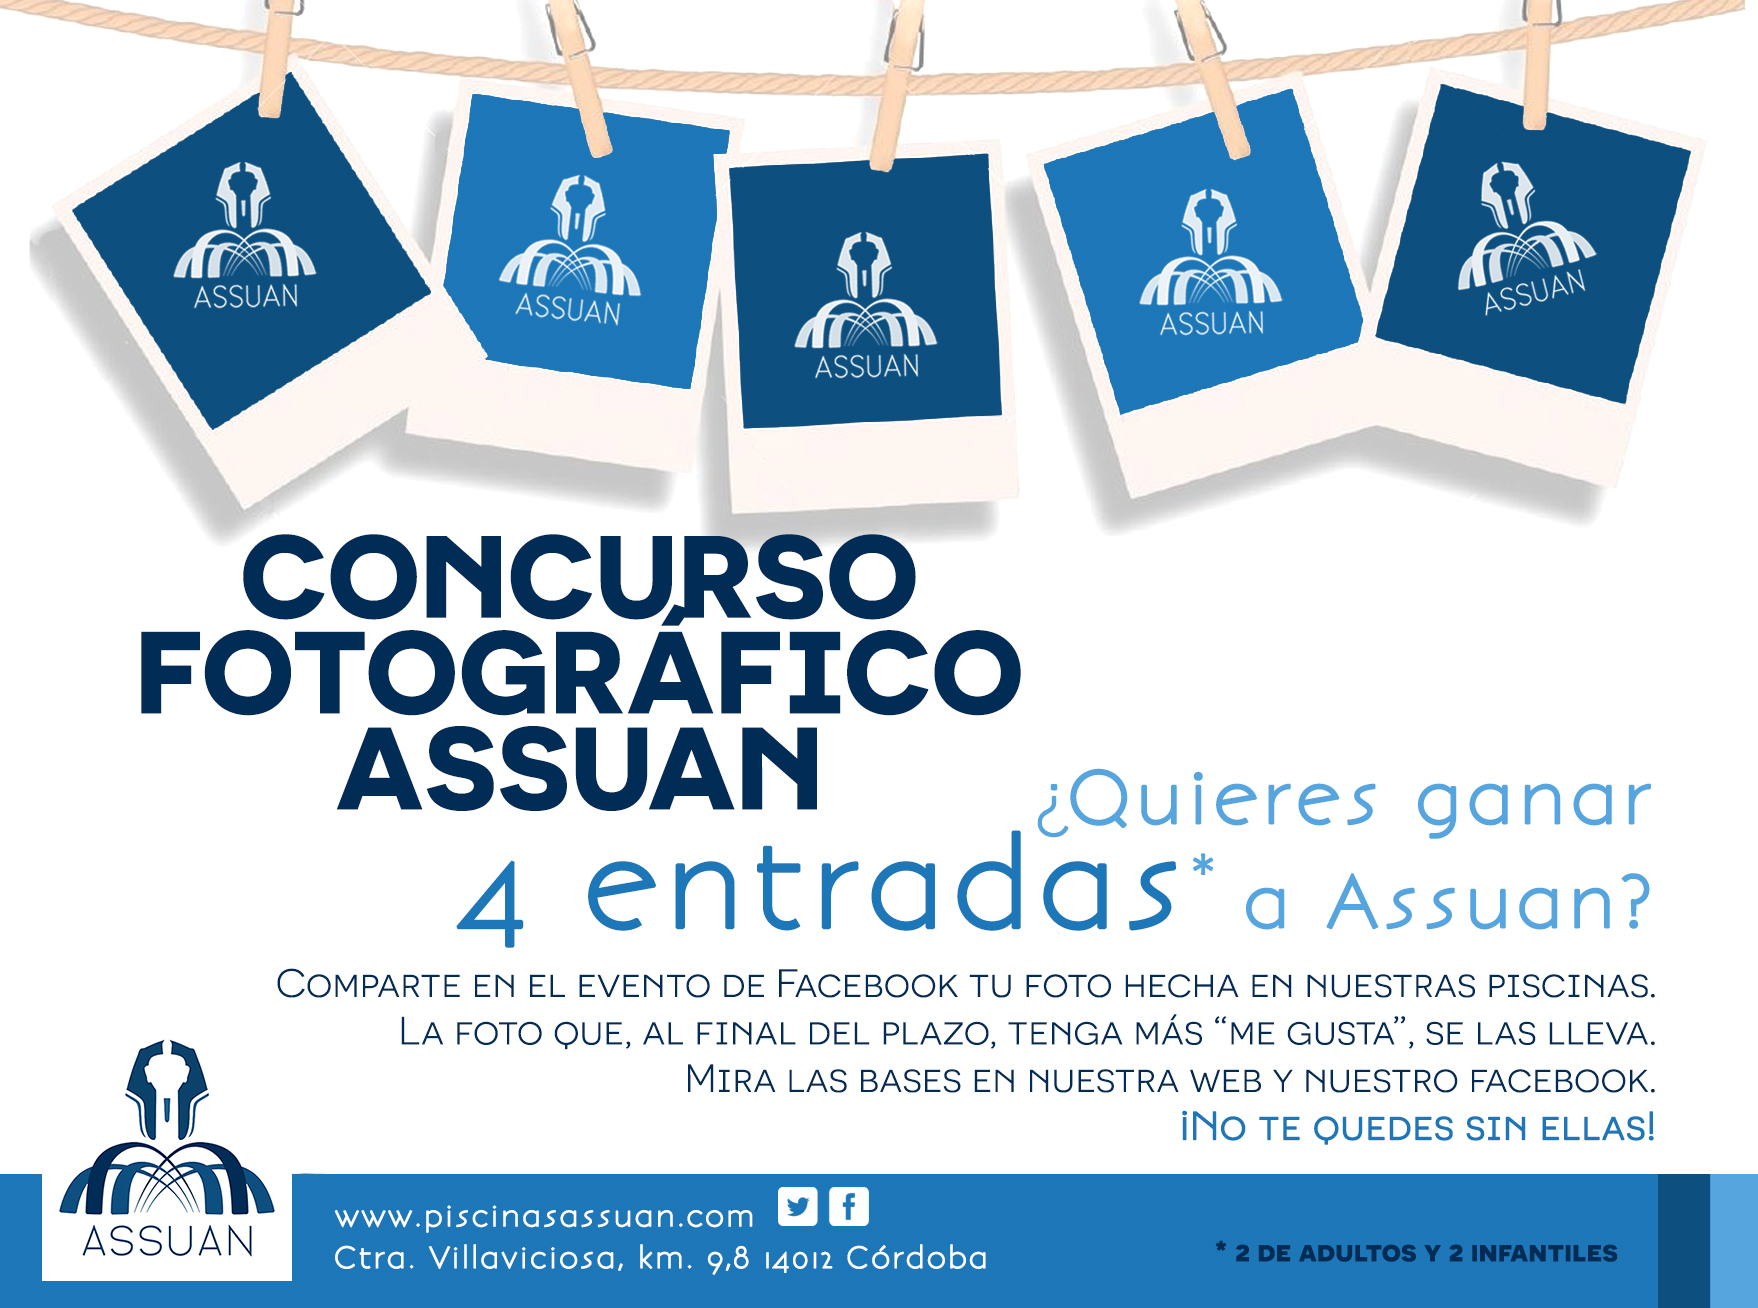 Concurso Fotográfico Assuán 2016